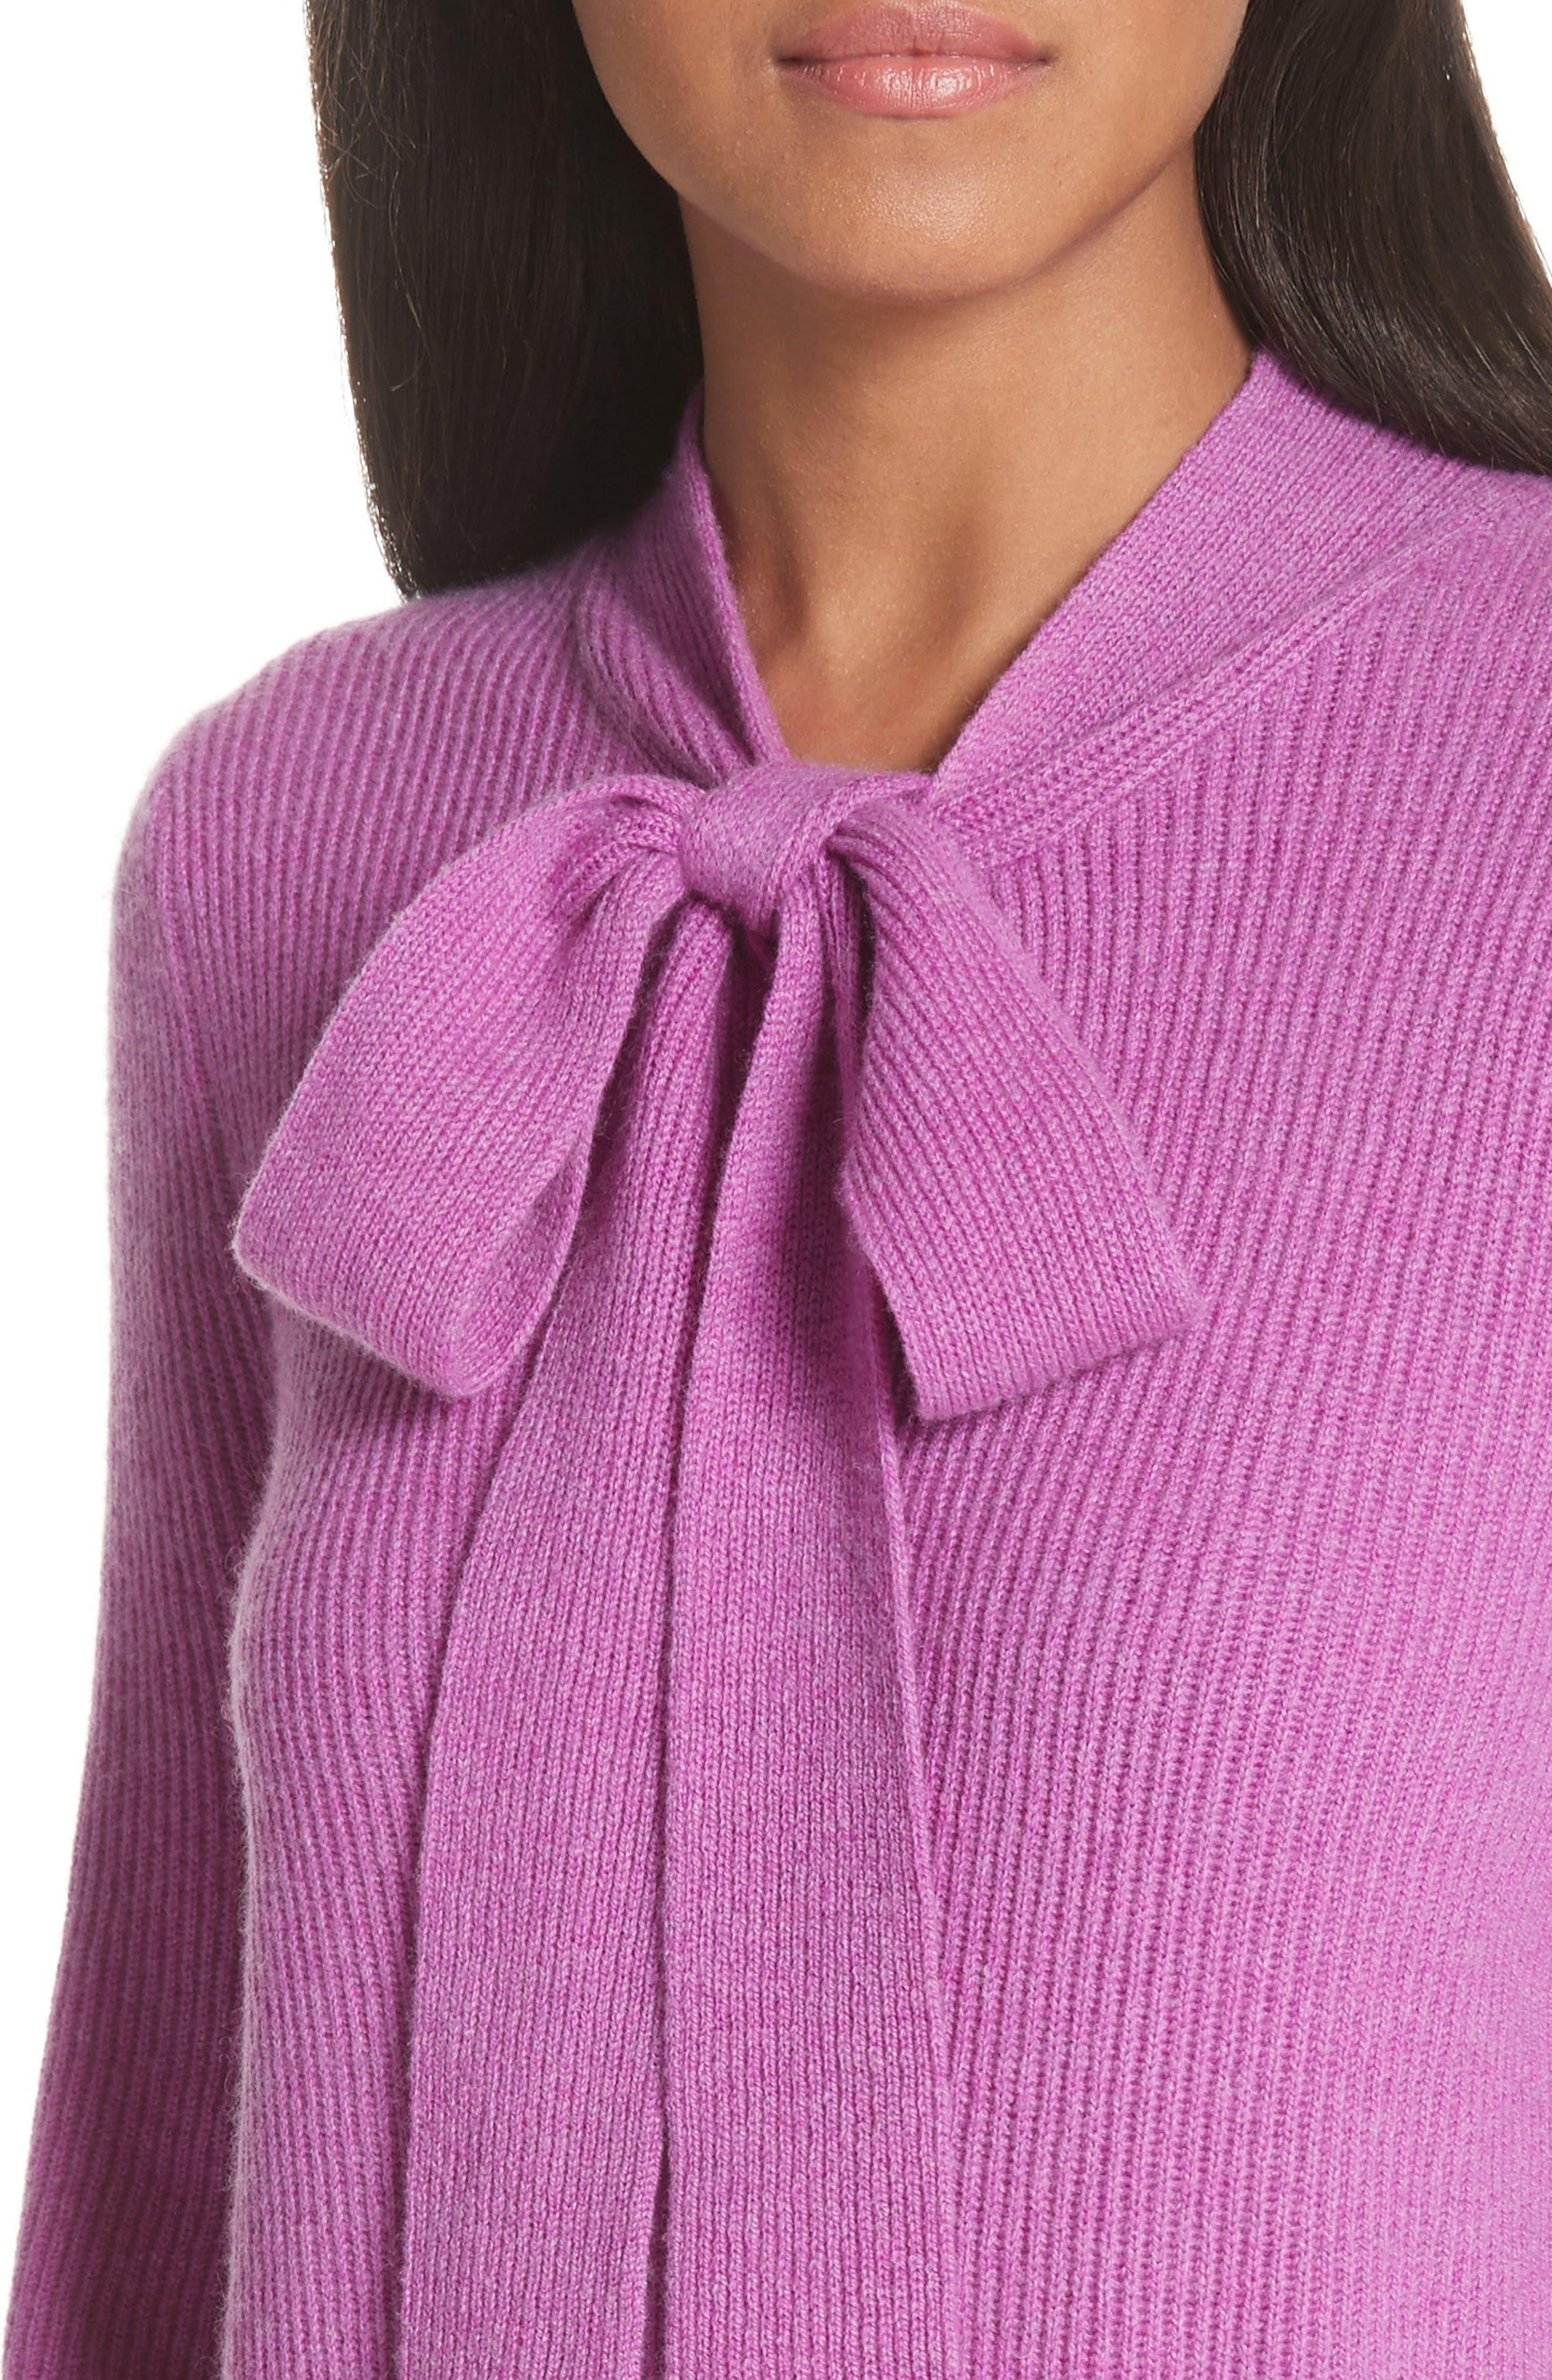 CO,                             Tie Neck Cashmere Sweater,                             Alternate thumbnail 4, color,                             679